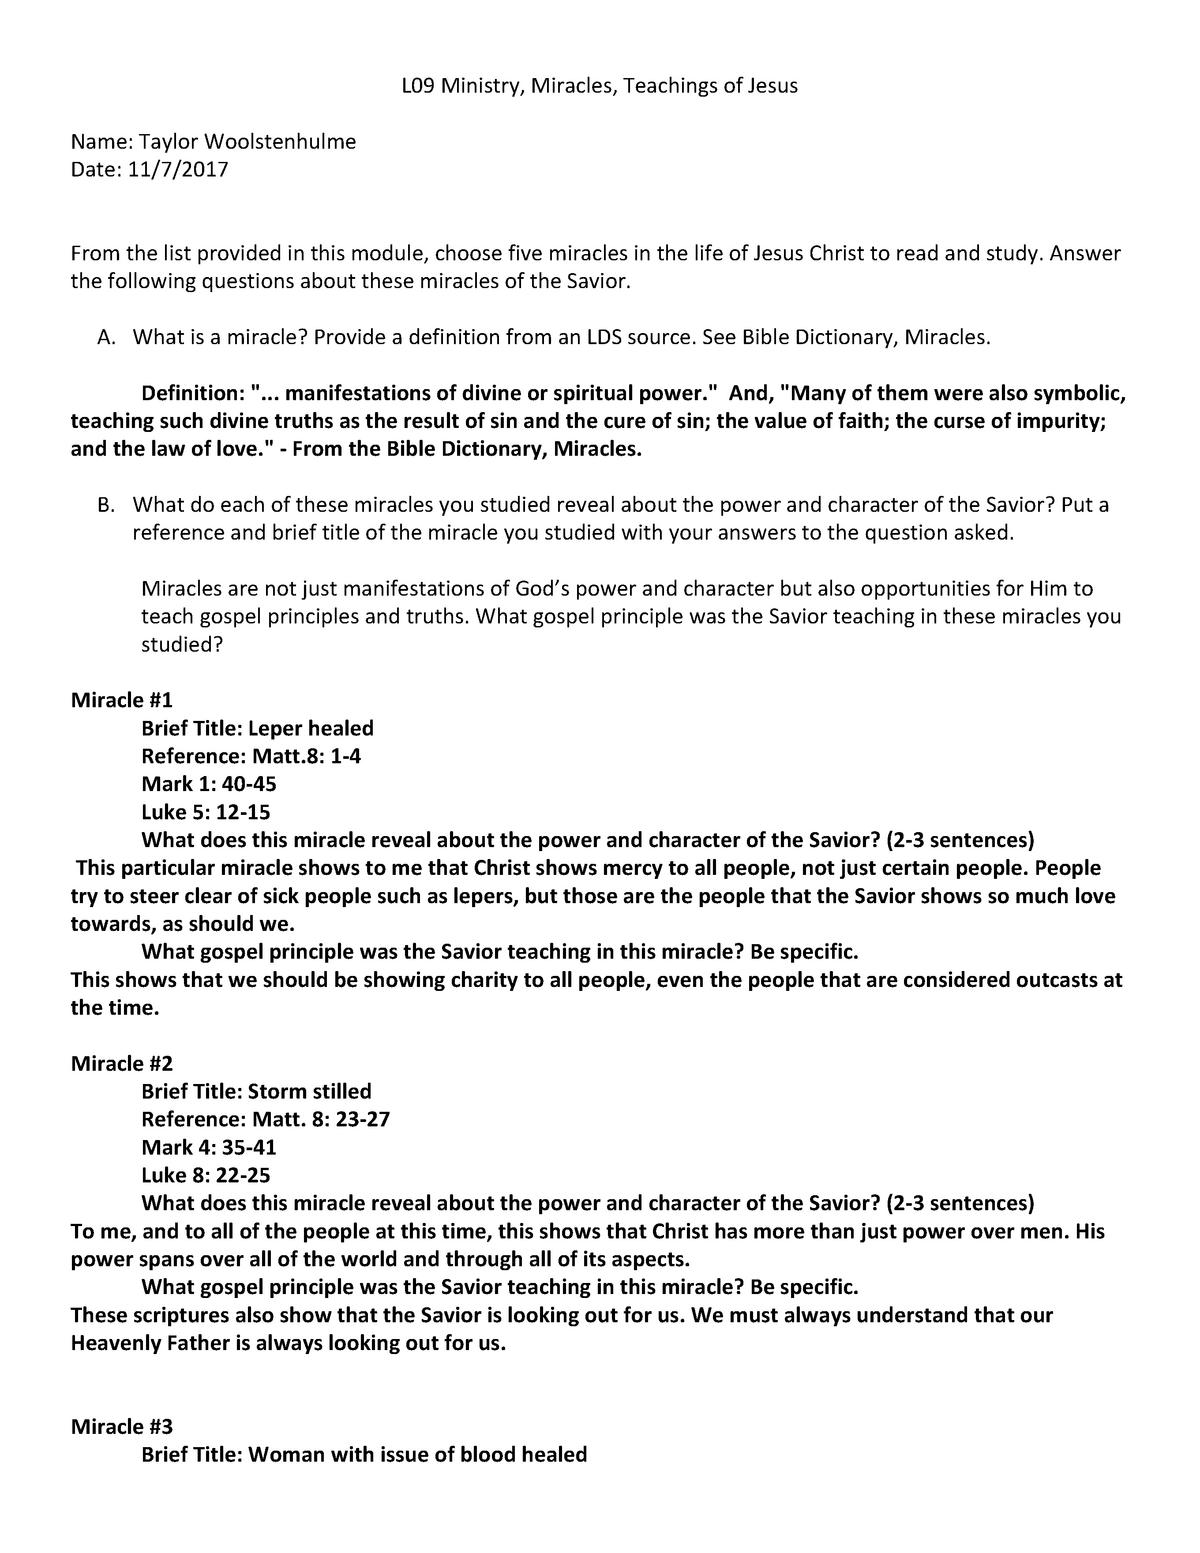 Fd Rel 250 Lesson 09 Writing Template - FDREL225 - BYU–Idaho